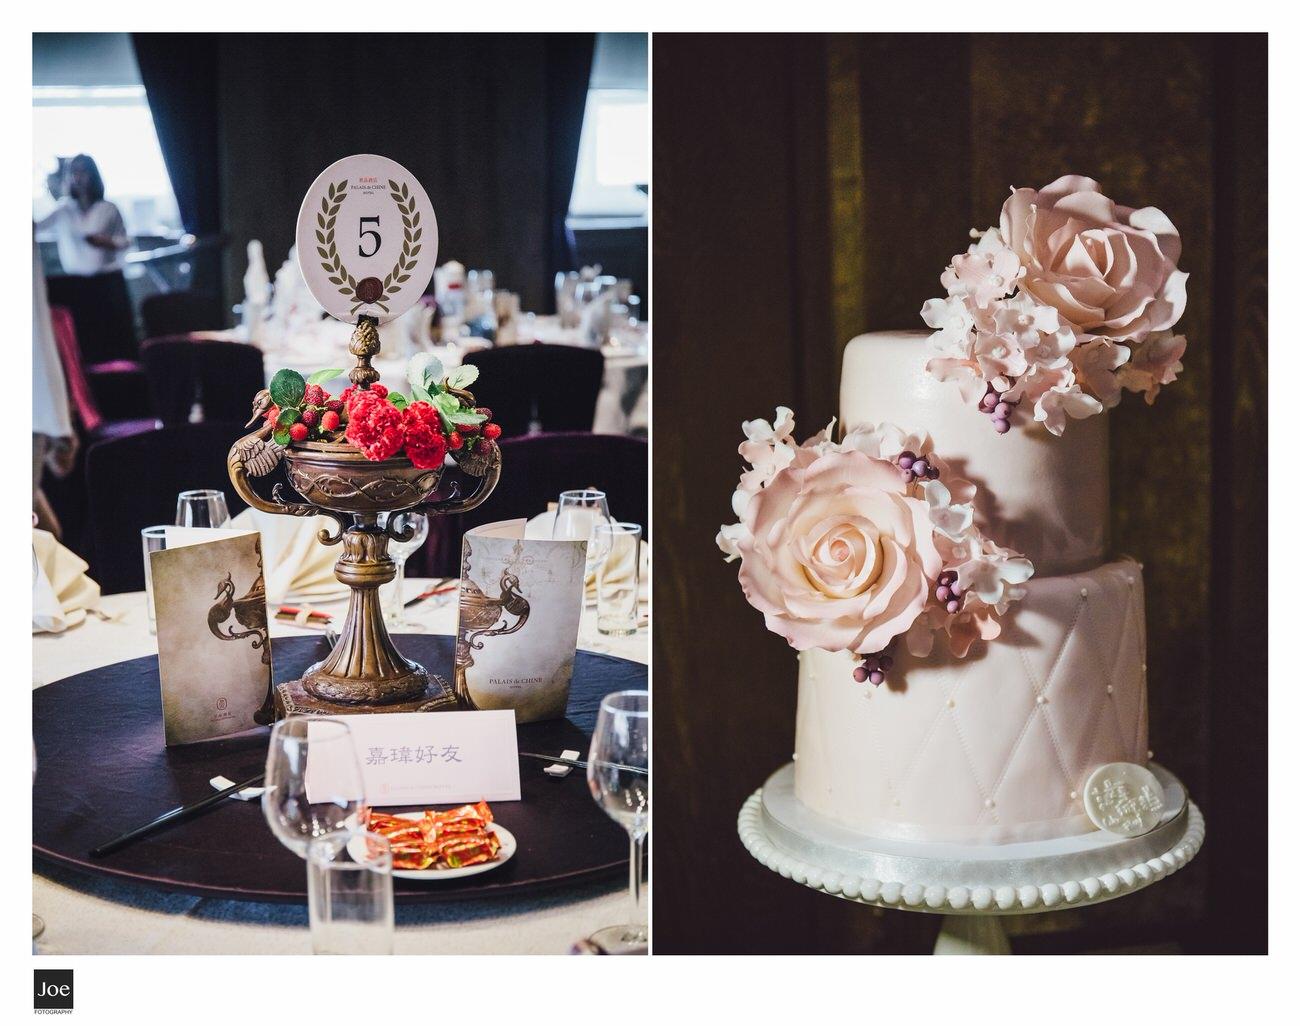 joe-fotography-wedding-photo-palais-de-chine-hotel-011.jpg